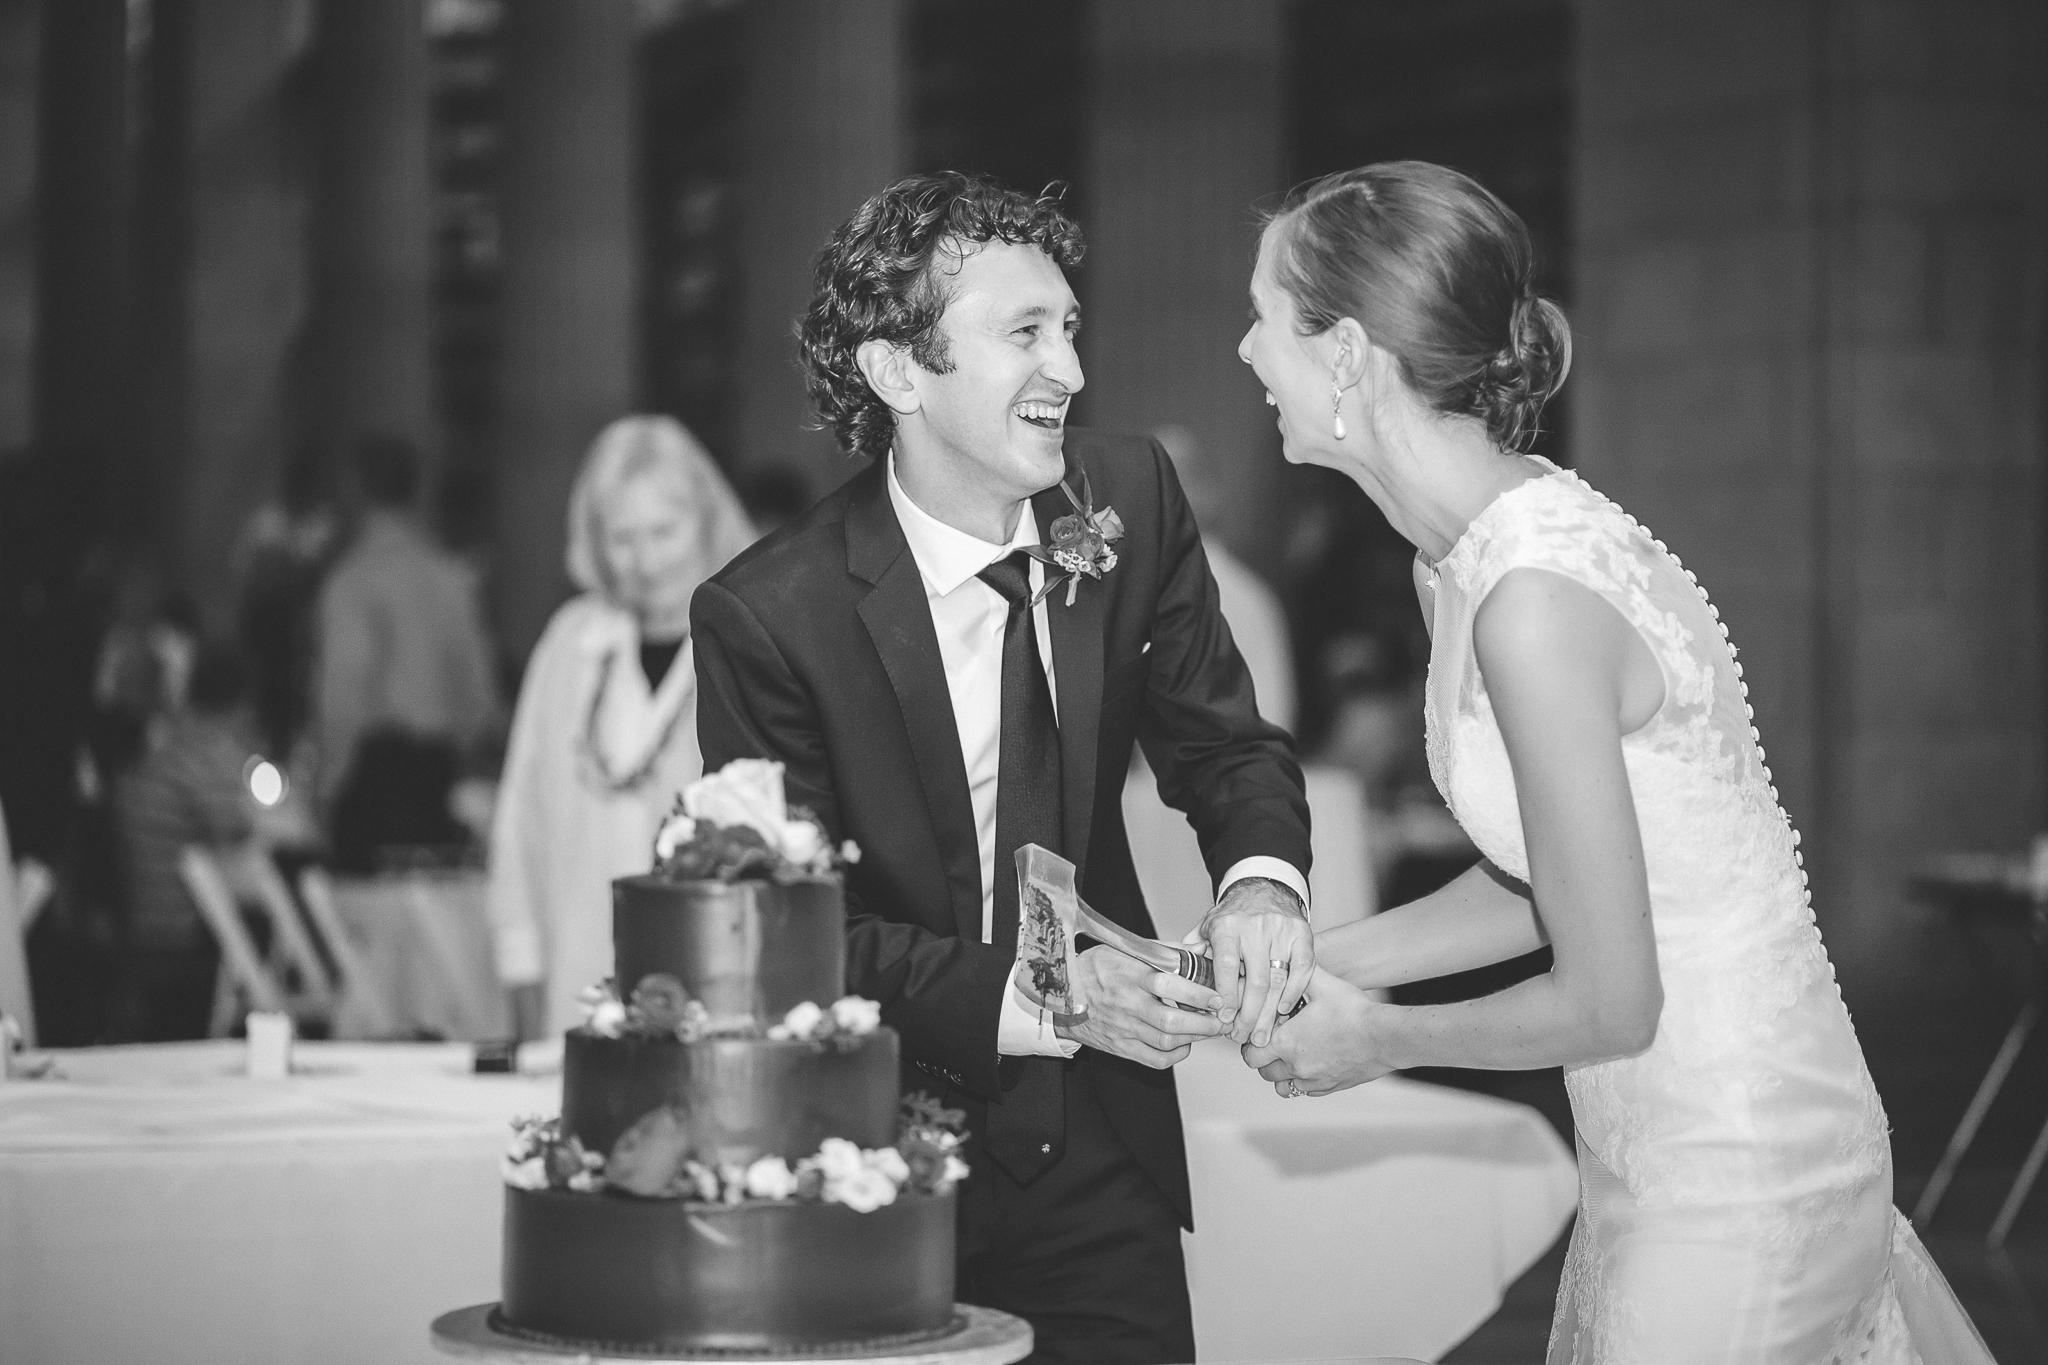 james j hill library wedding photography-29.jpg